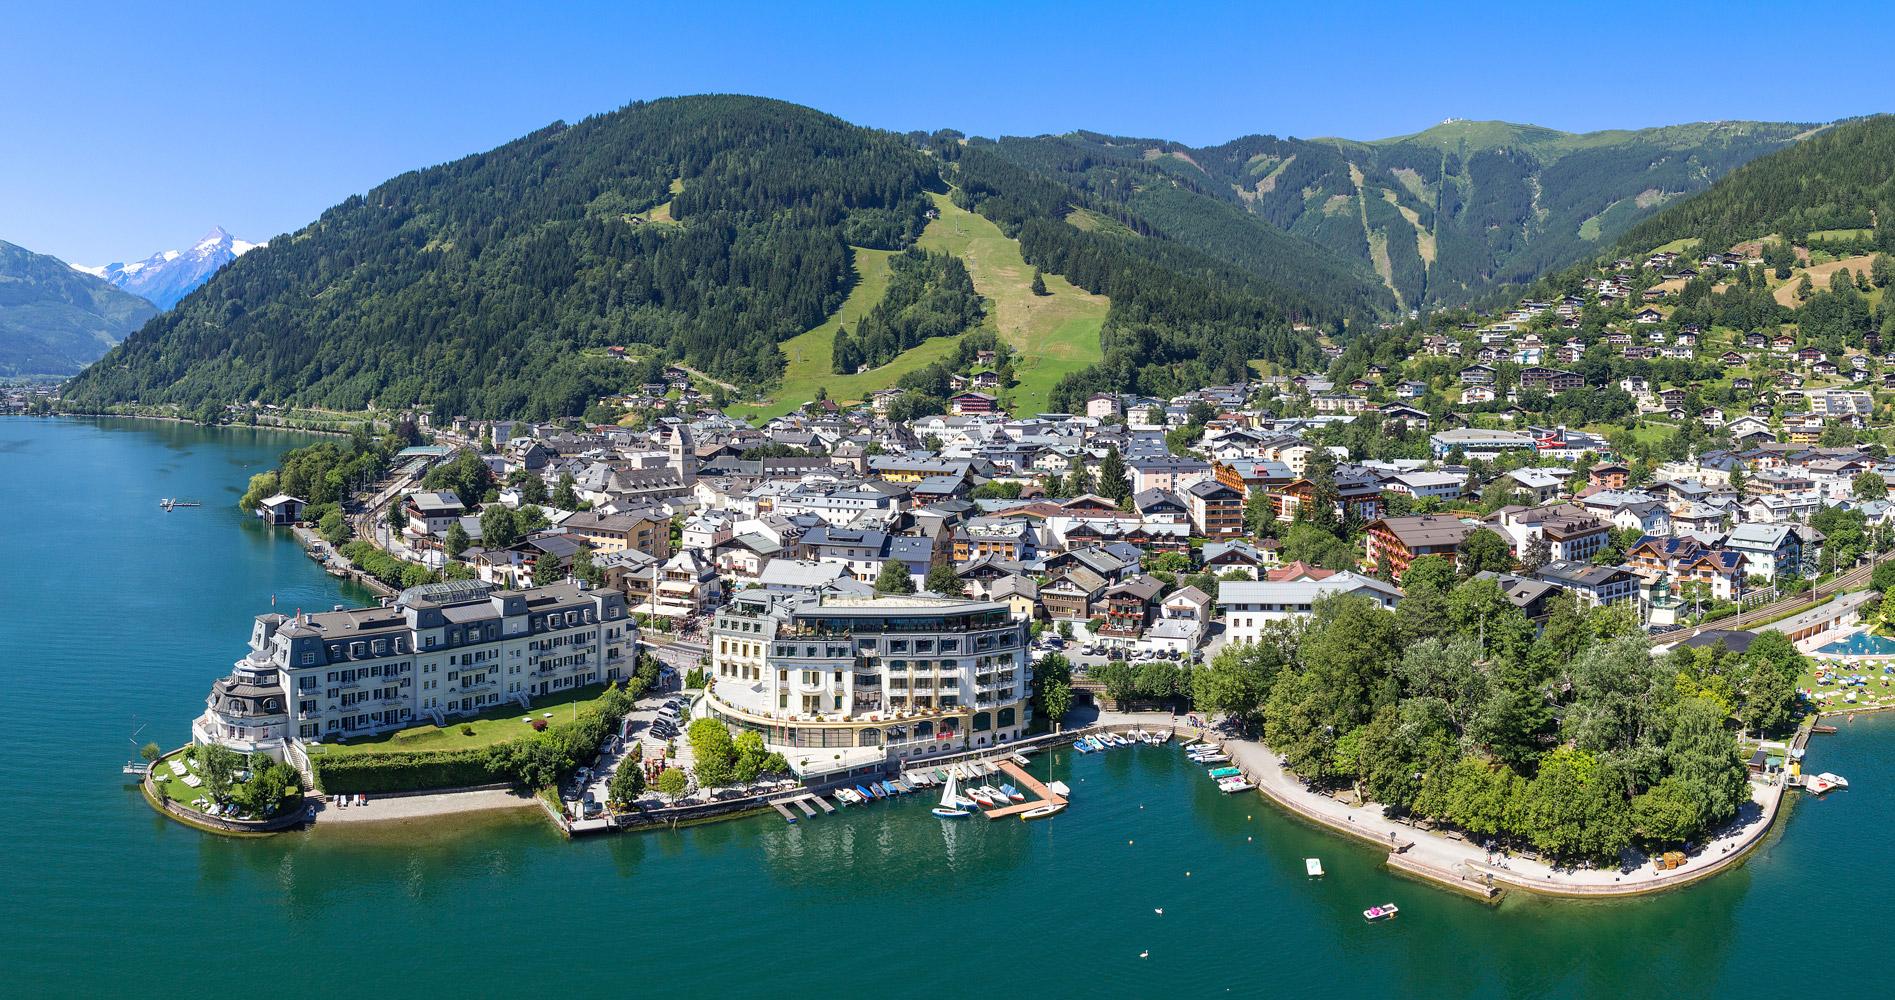 Обои alps, salzburg, целль-ам-зе, austria, Zell am see, зальцбург, австрия. Пейзажи foto 19